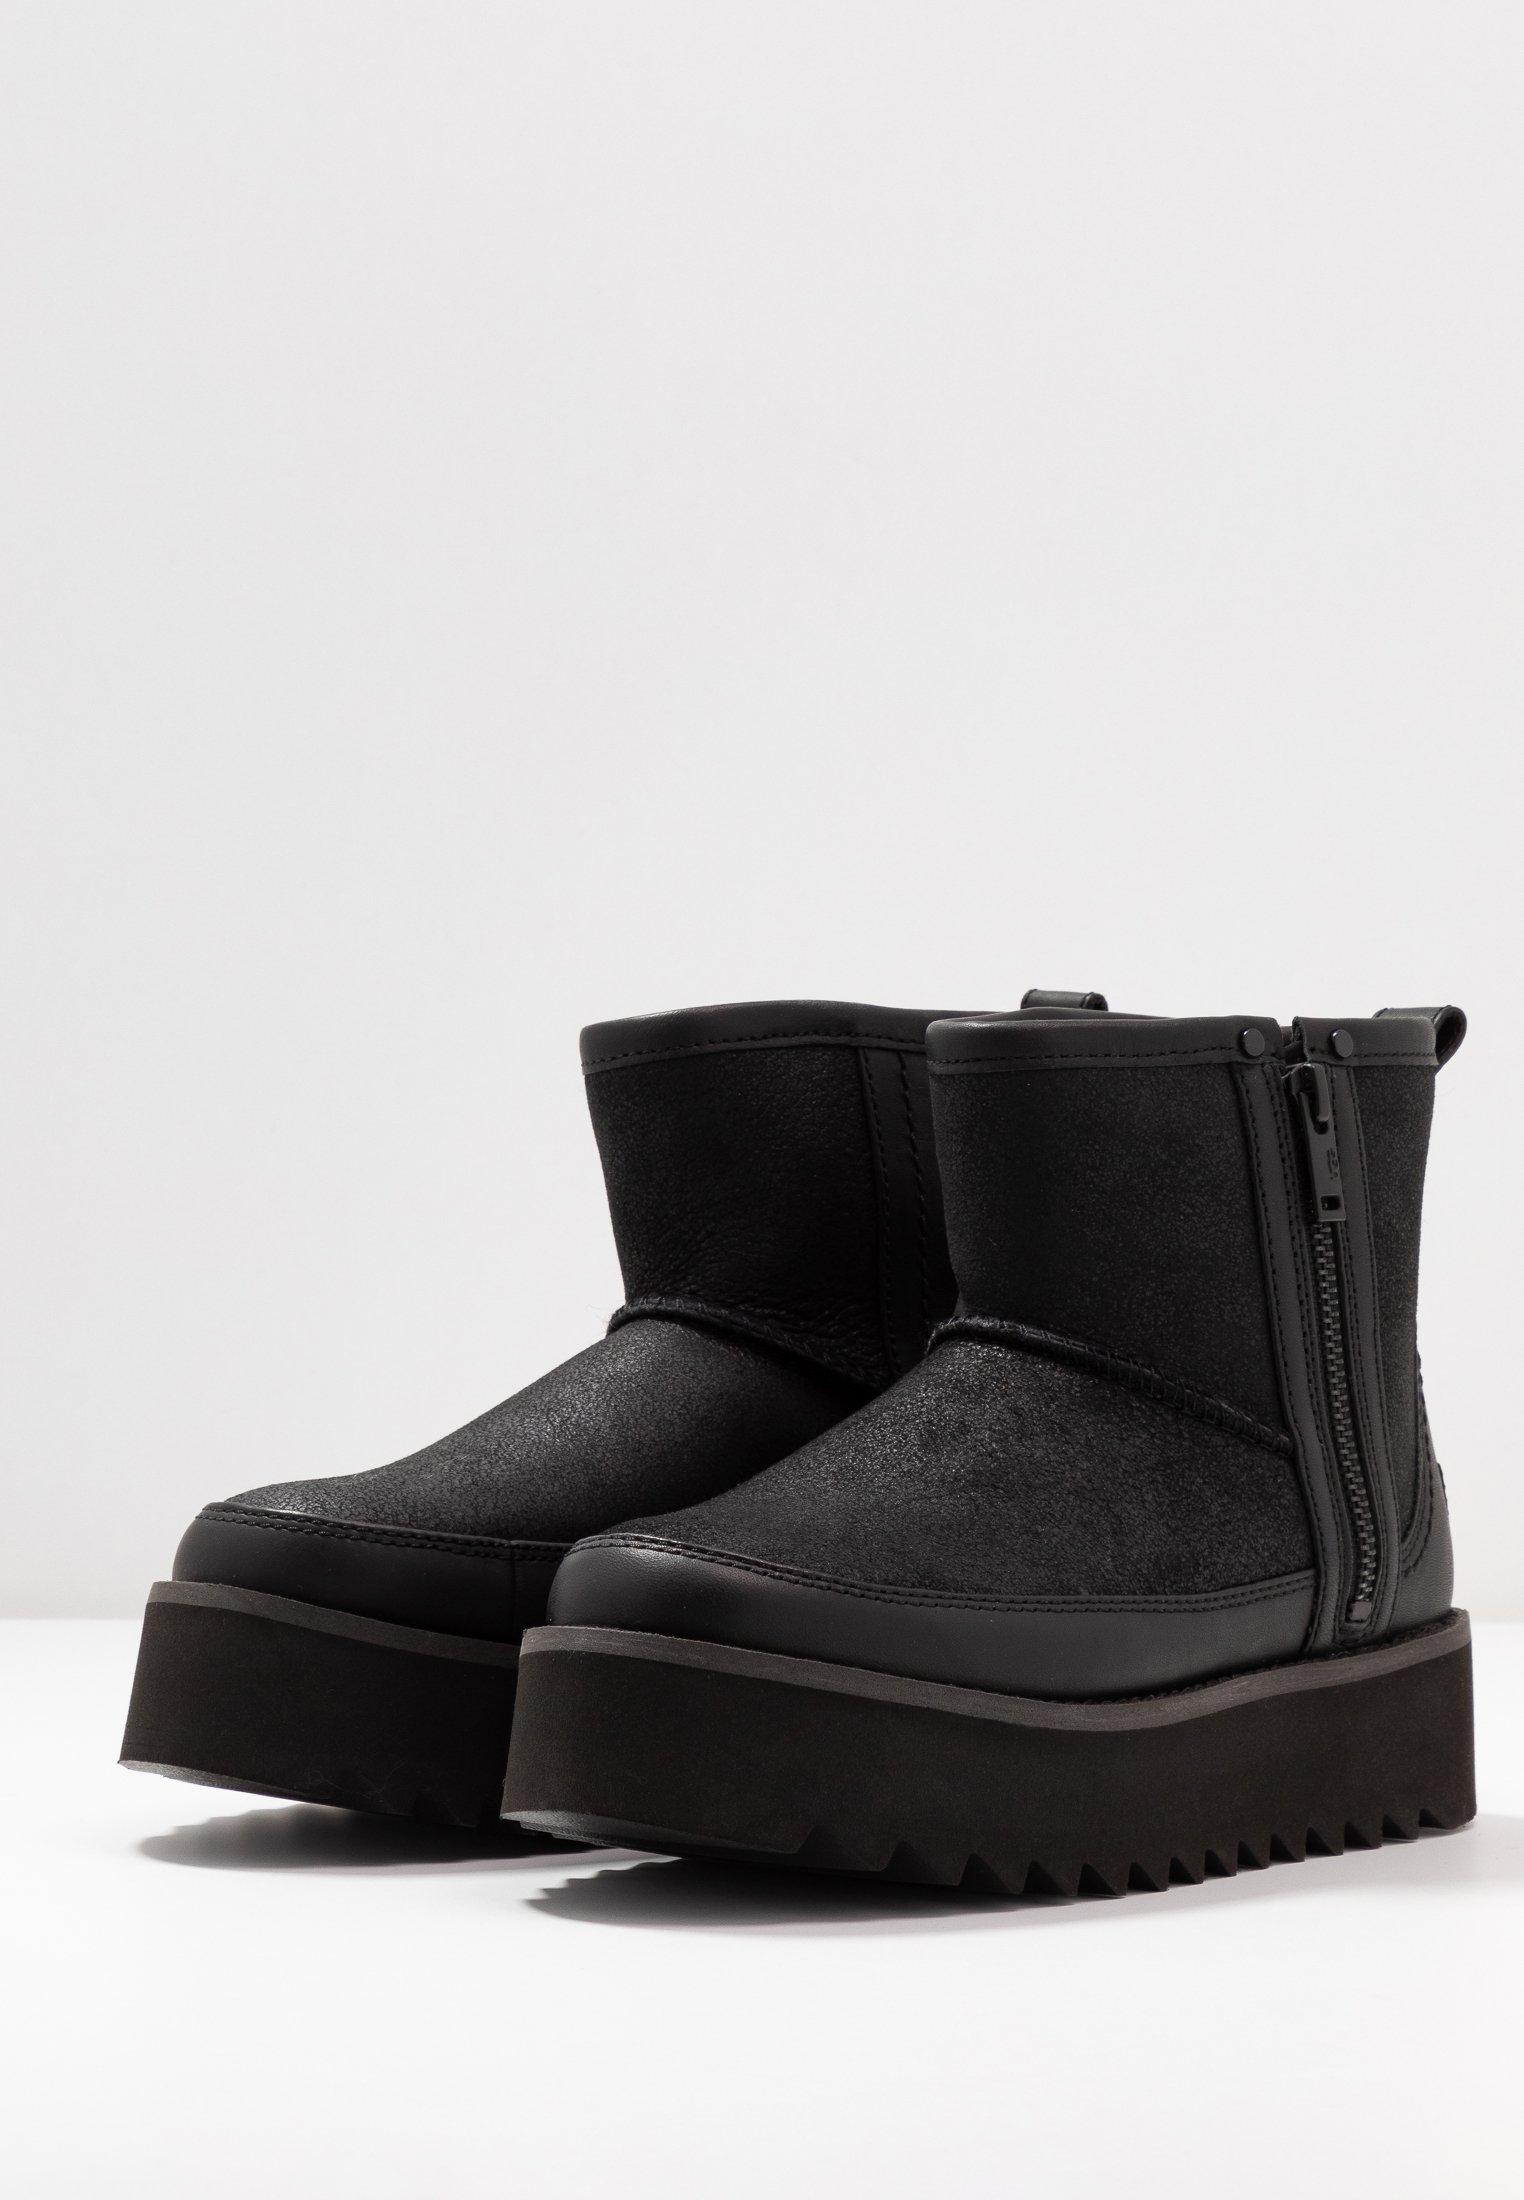 UGG CLASSIC REBEL BIKER MINI - Platform-nilkkurit - black - Naisten kengät xmDC1